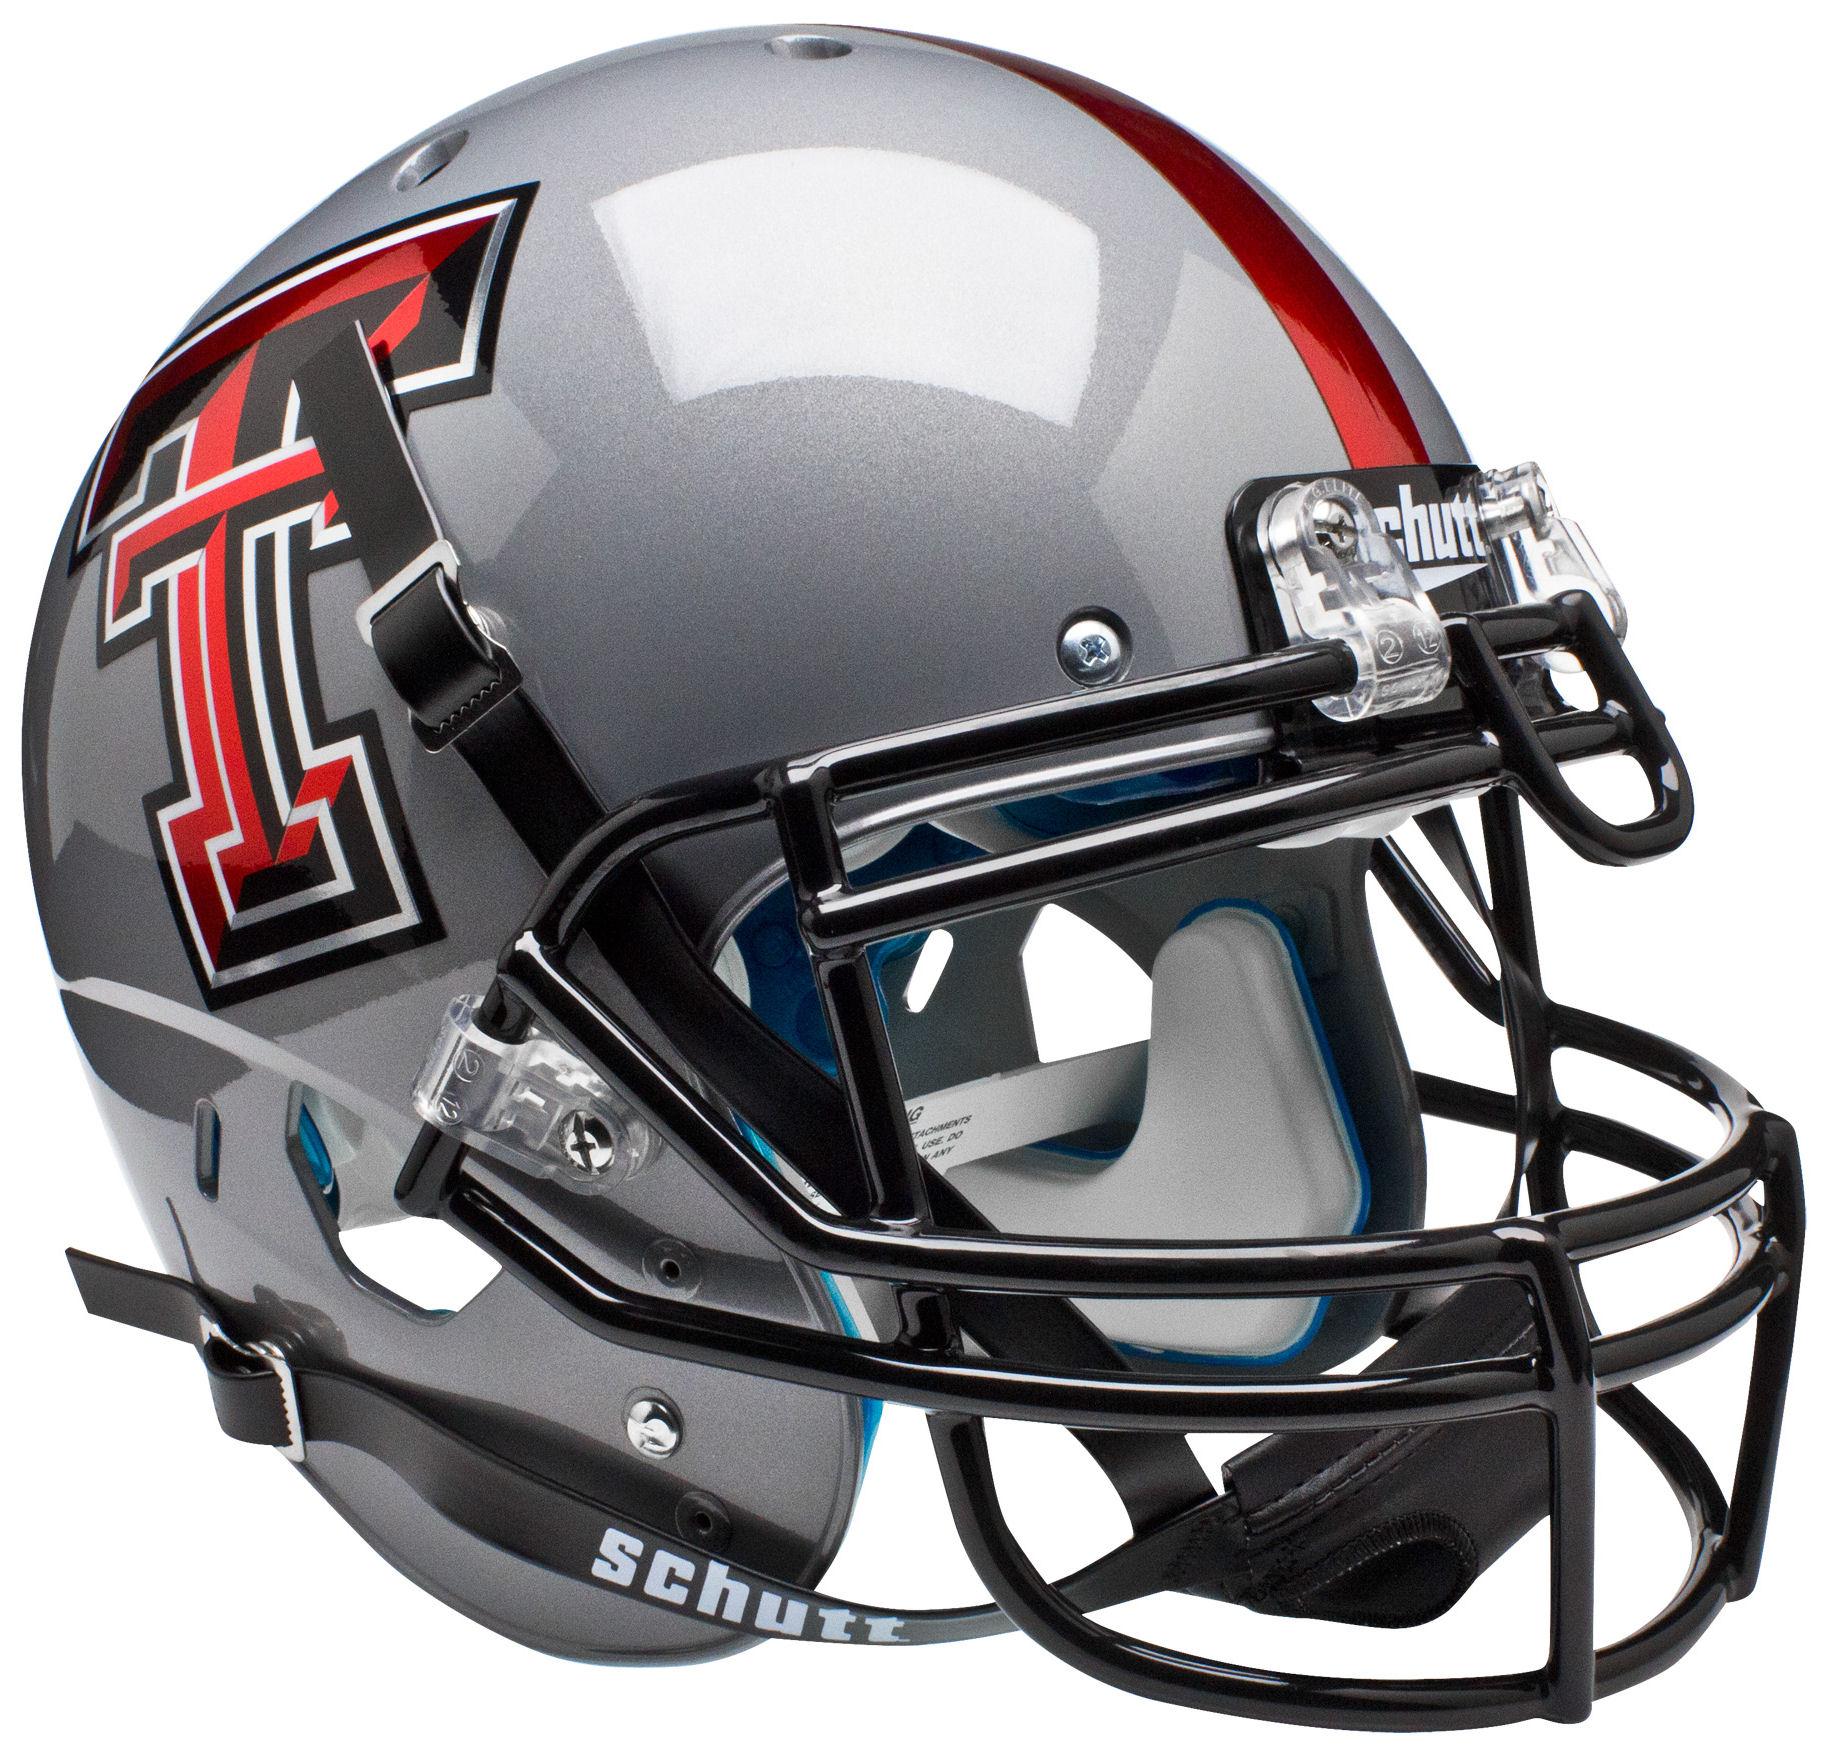 Texas Tech Red Raiders Authentic College XP Football Helmet Schutt <B>Gray</B>